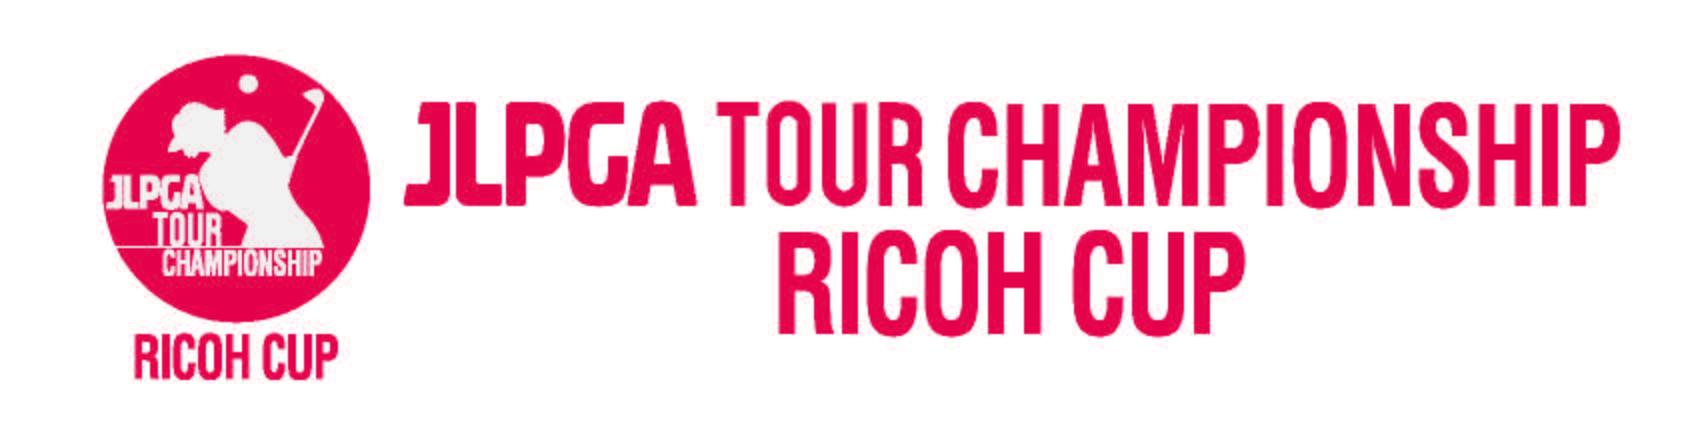 JLPGA Tour Championship Ricoh Cup